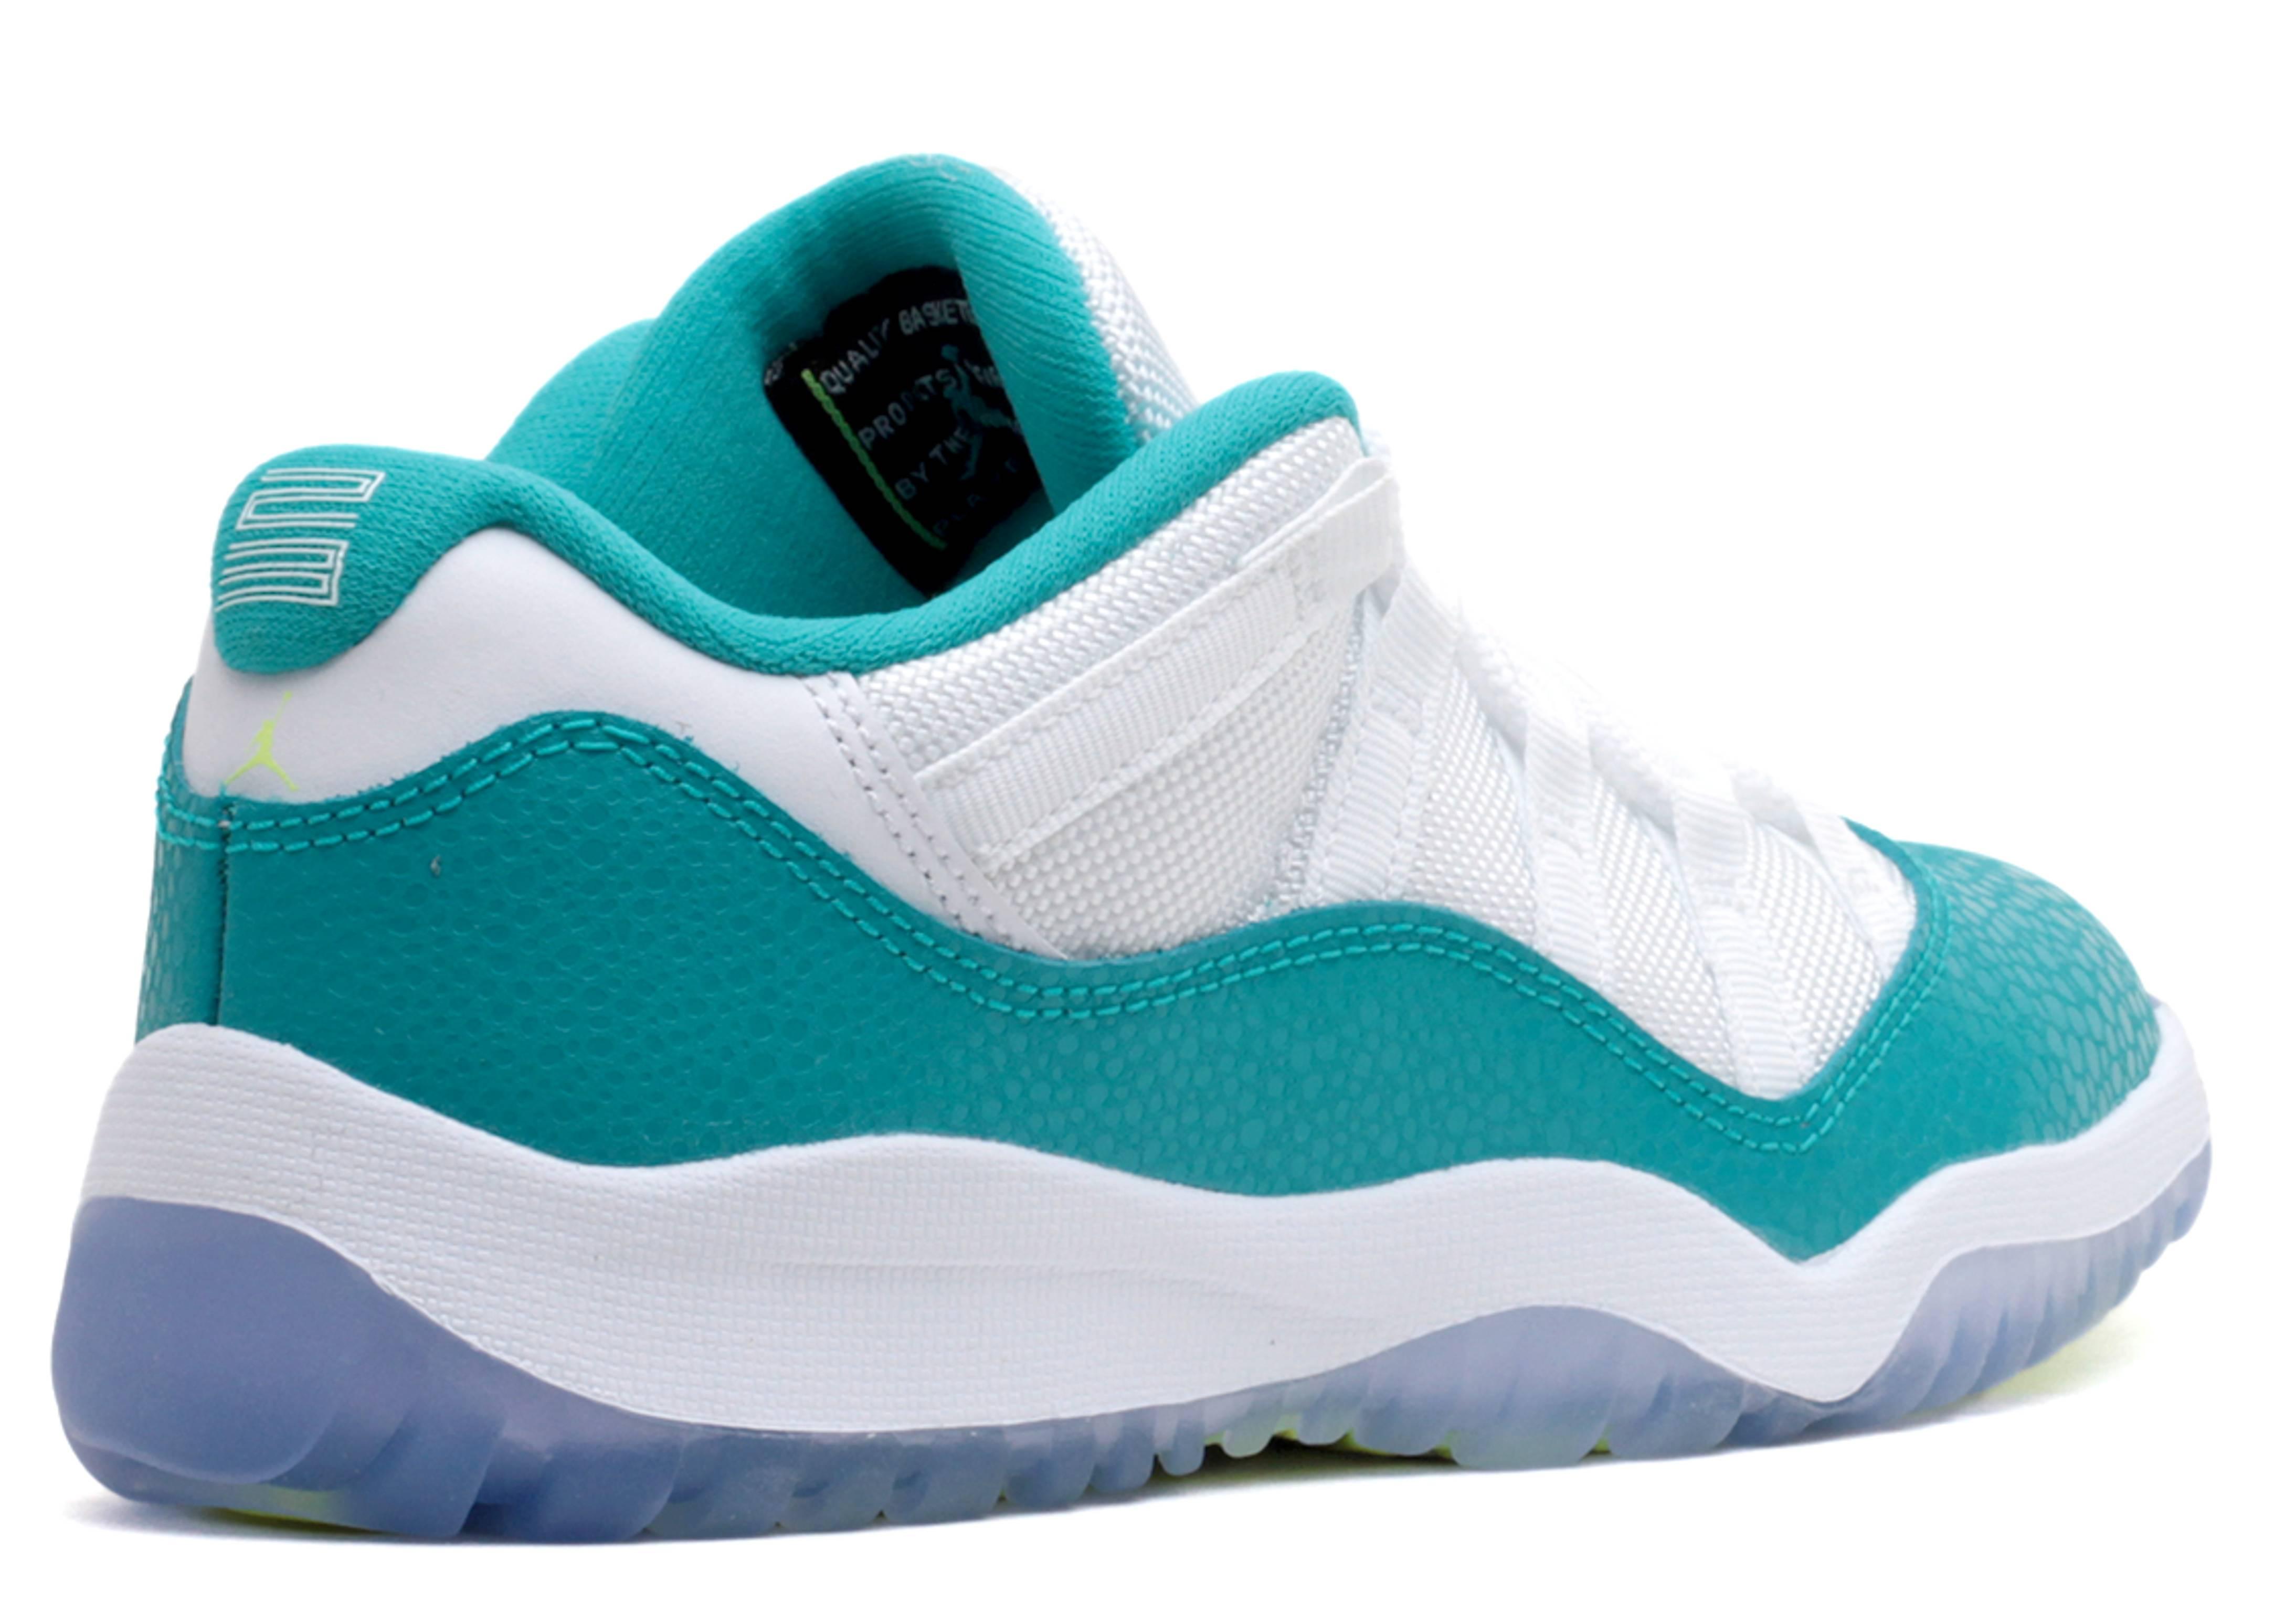 09b2a128839a5e Nike Men s Benassi JDI Slide Sandals from Finish Line. retro 5 white  infared green